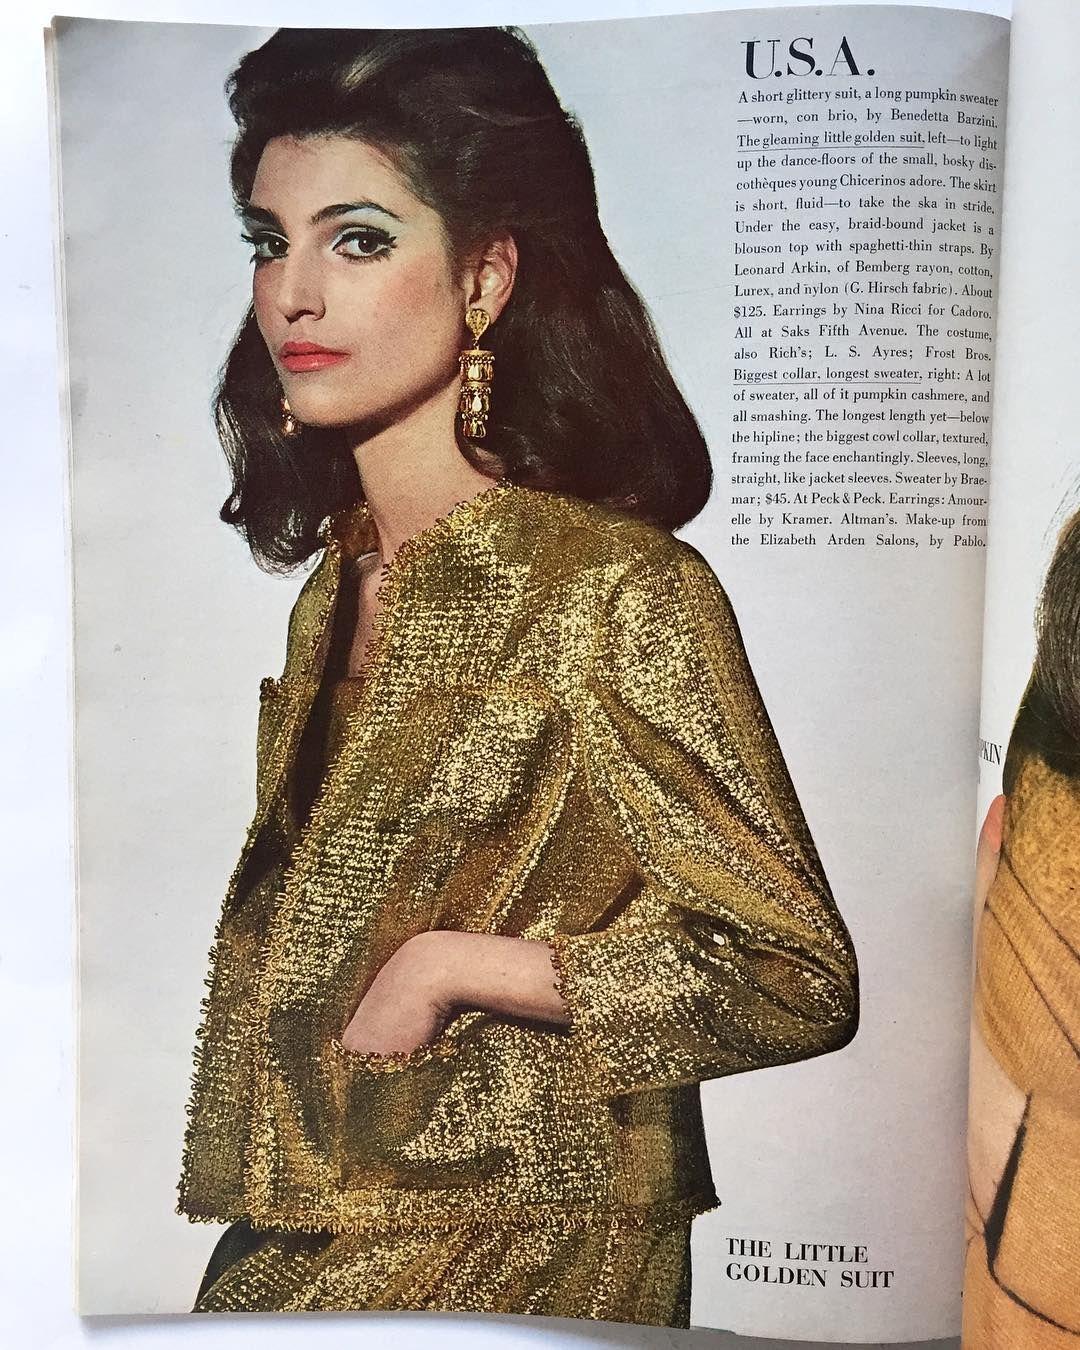 Benedetta Barzini In A Leonard Arkin Golden Suit Photo By